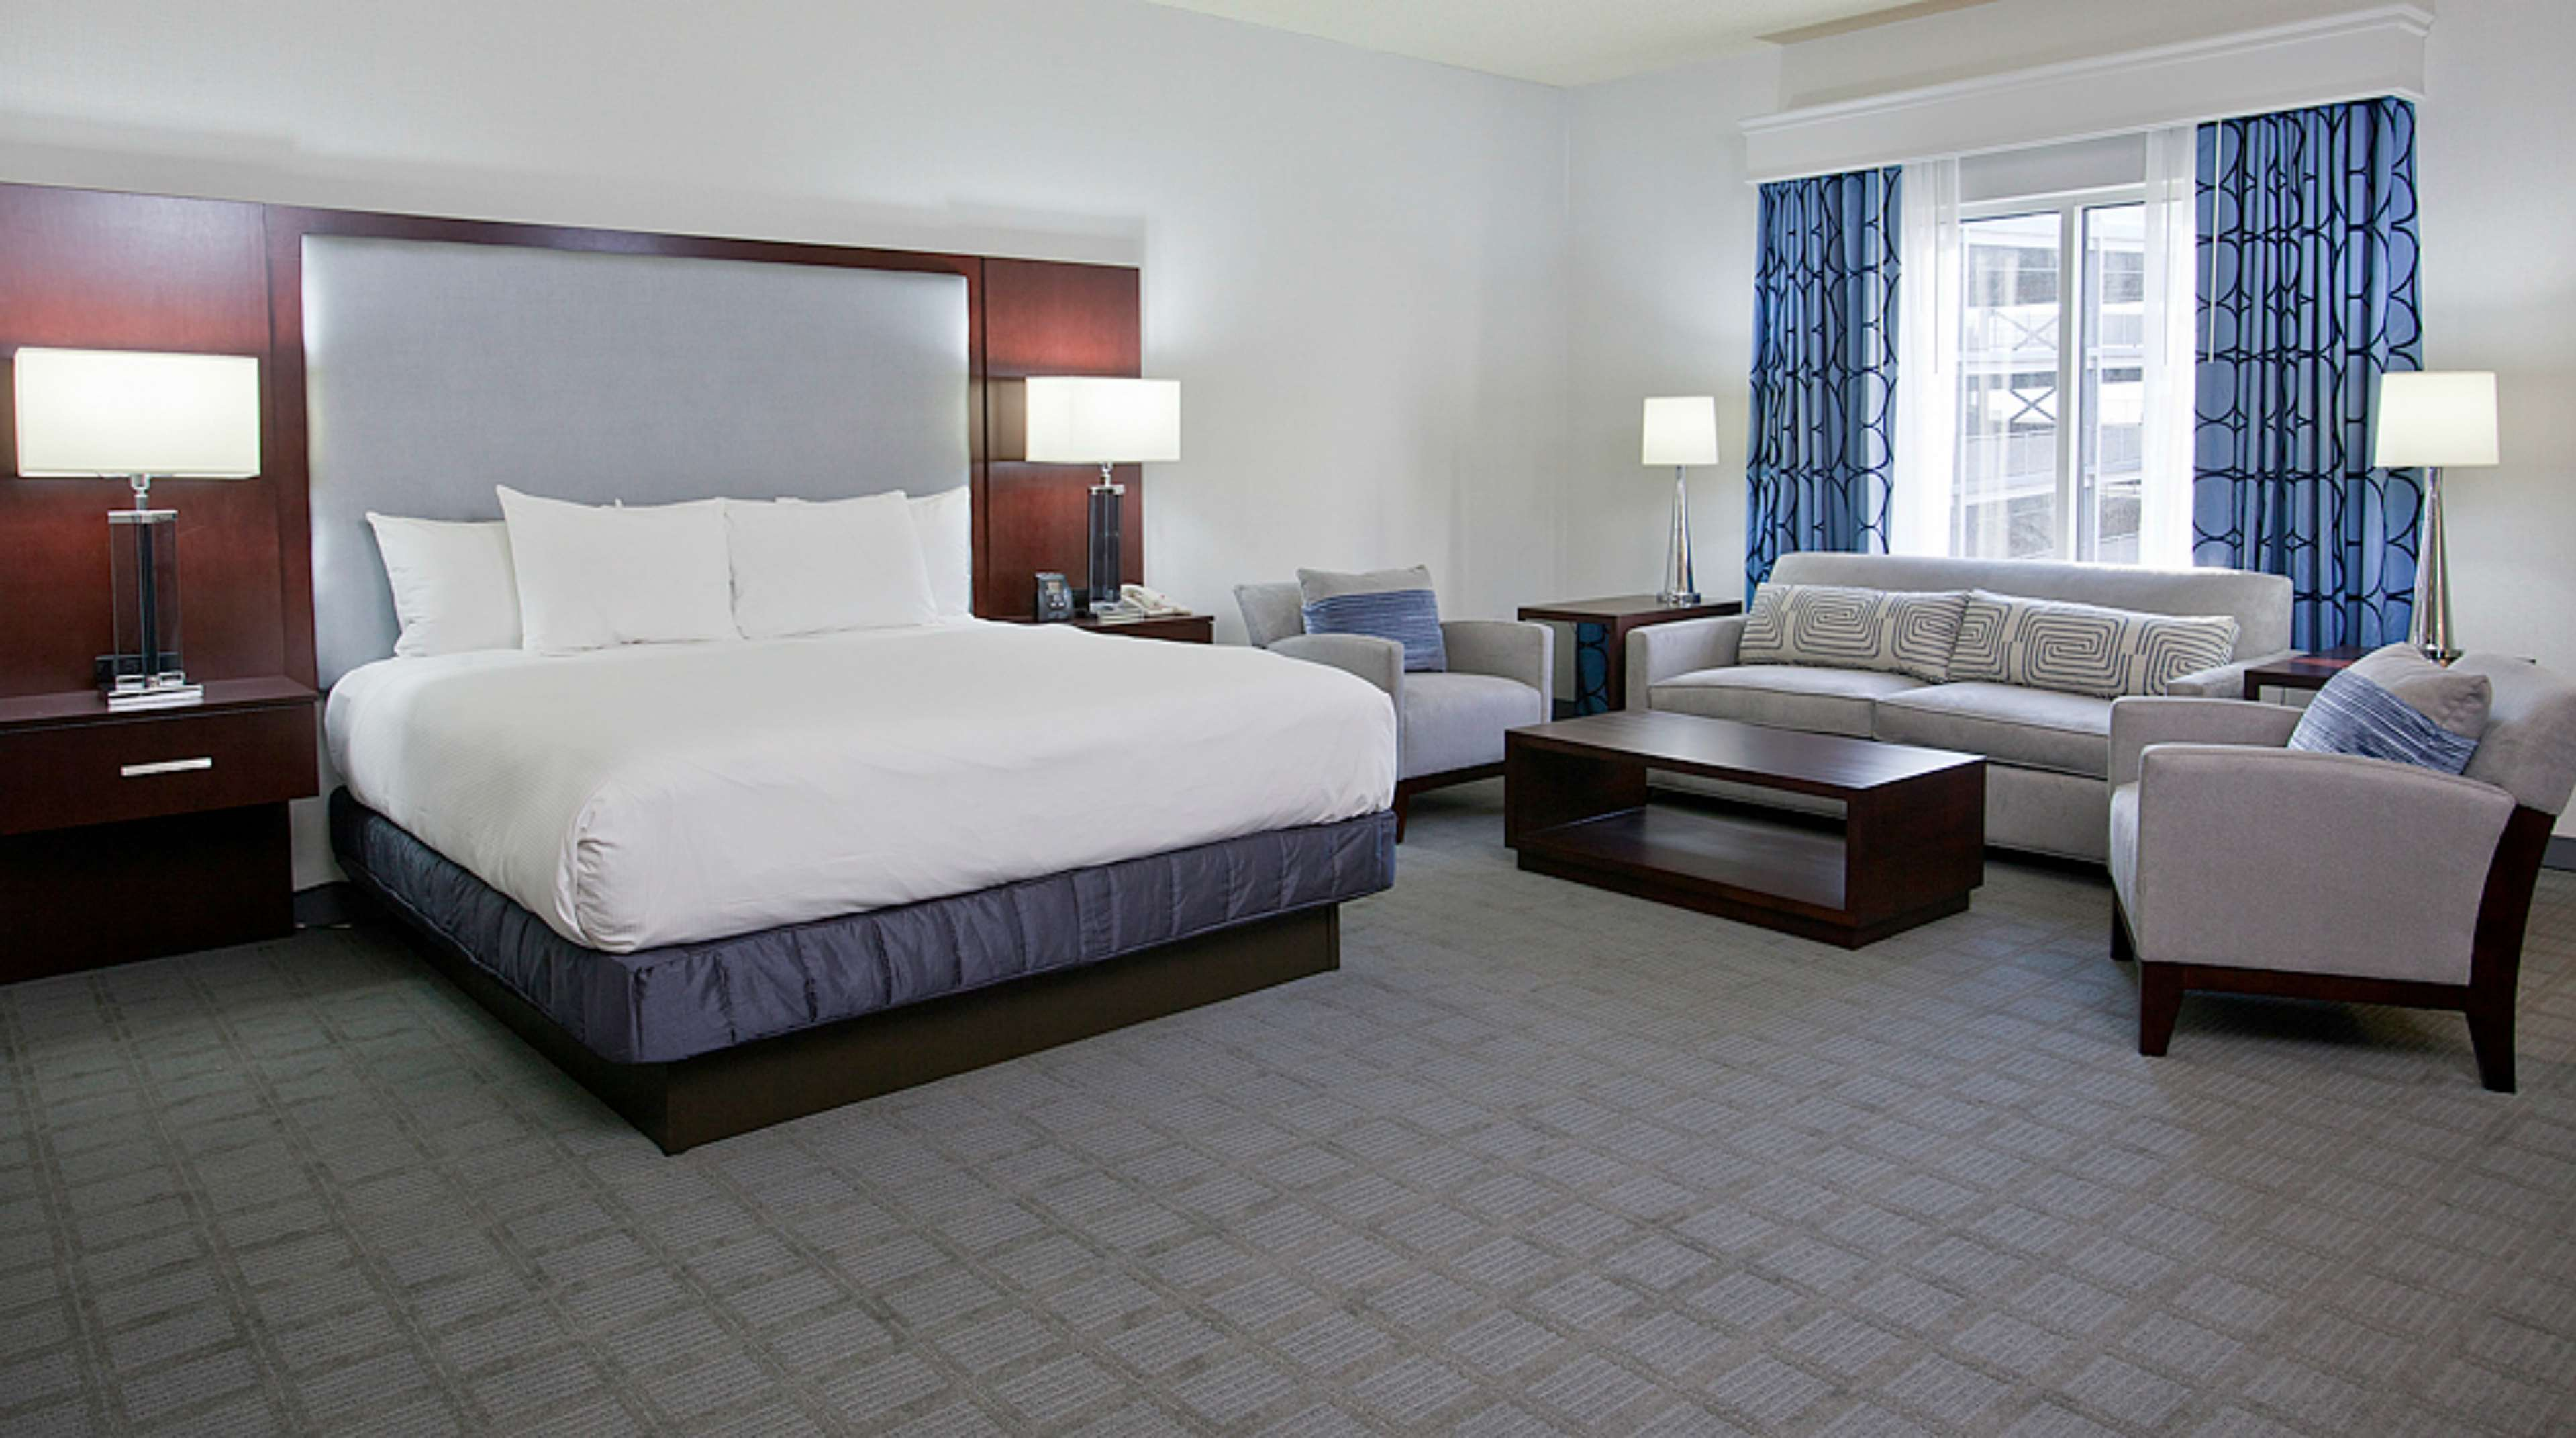 Hilton Scranton & Conference Center image 20